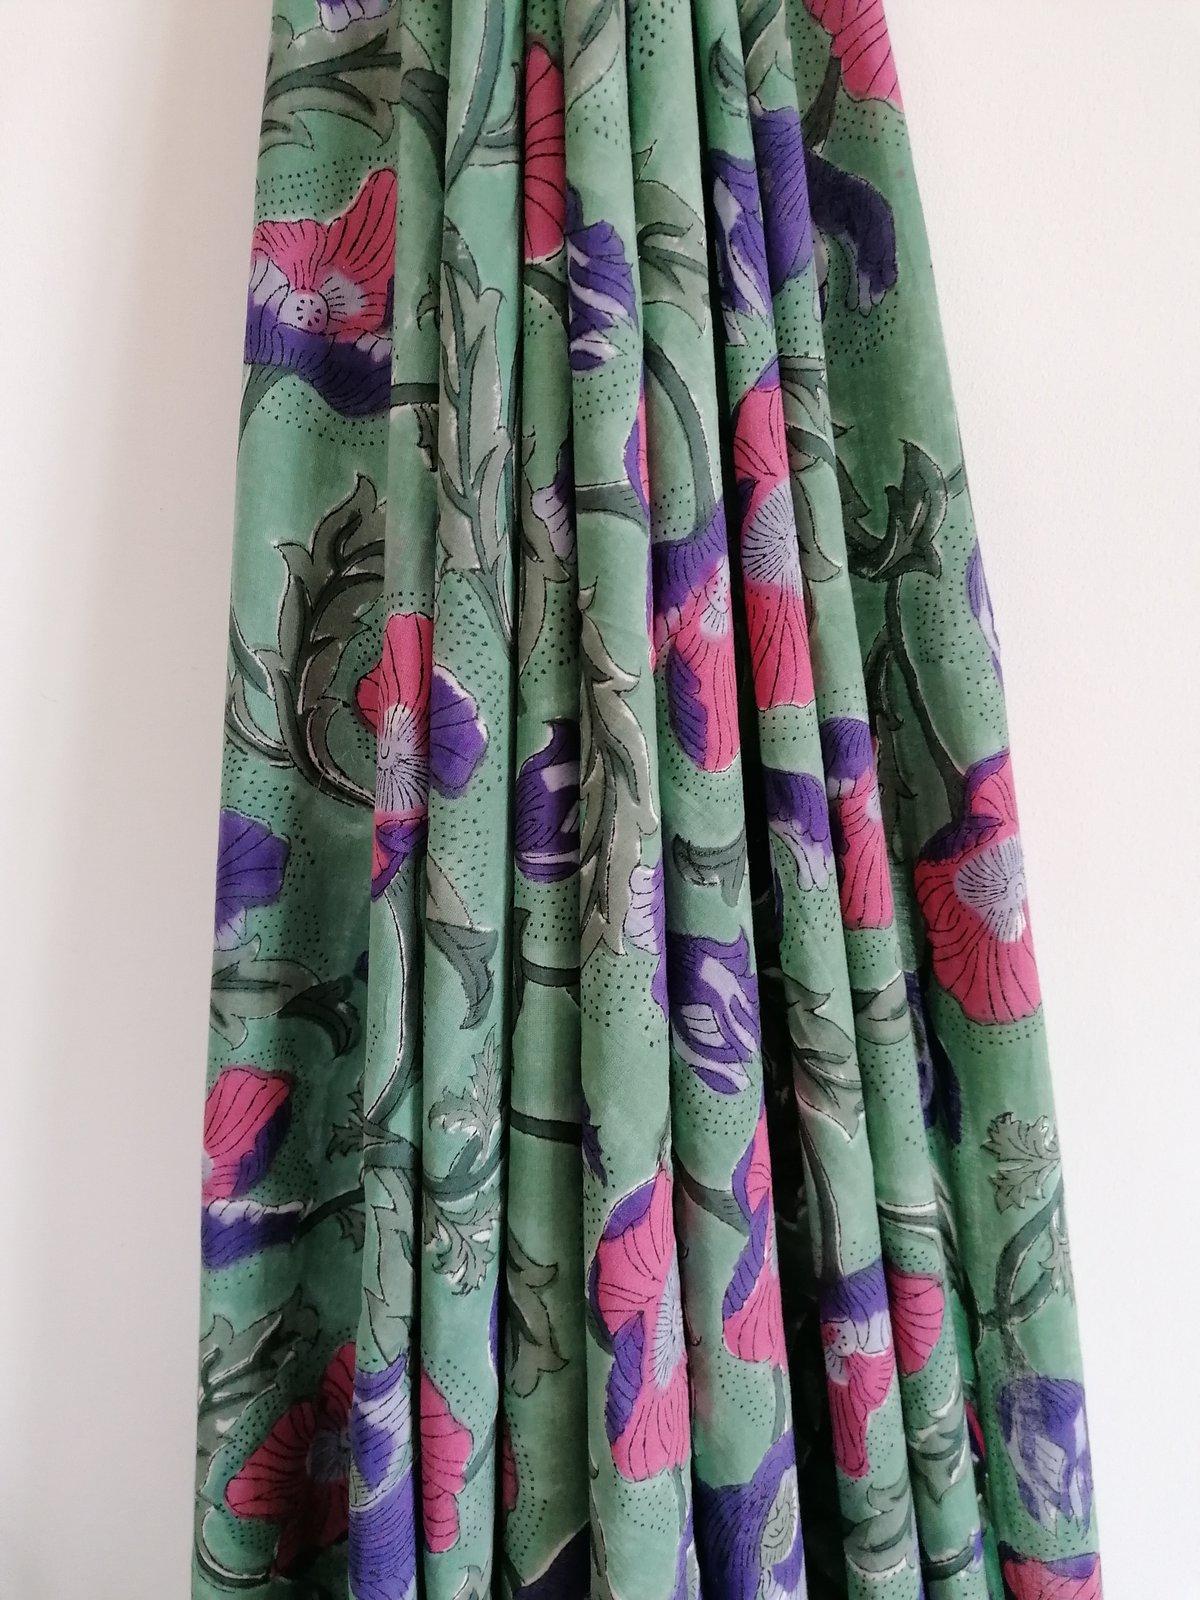 Image of Namasté fabric soleil levant vert